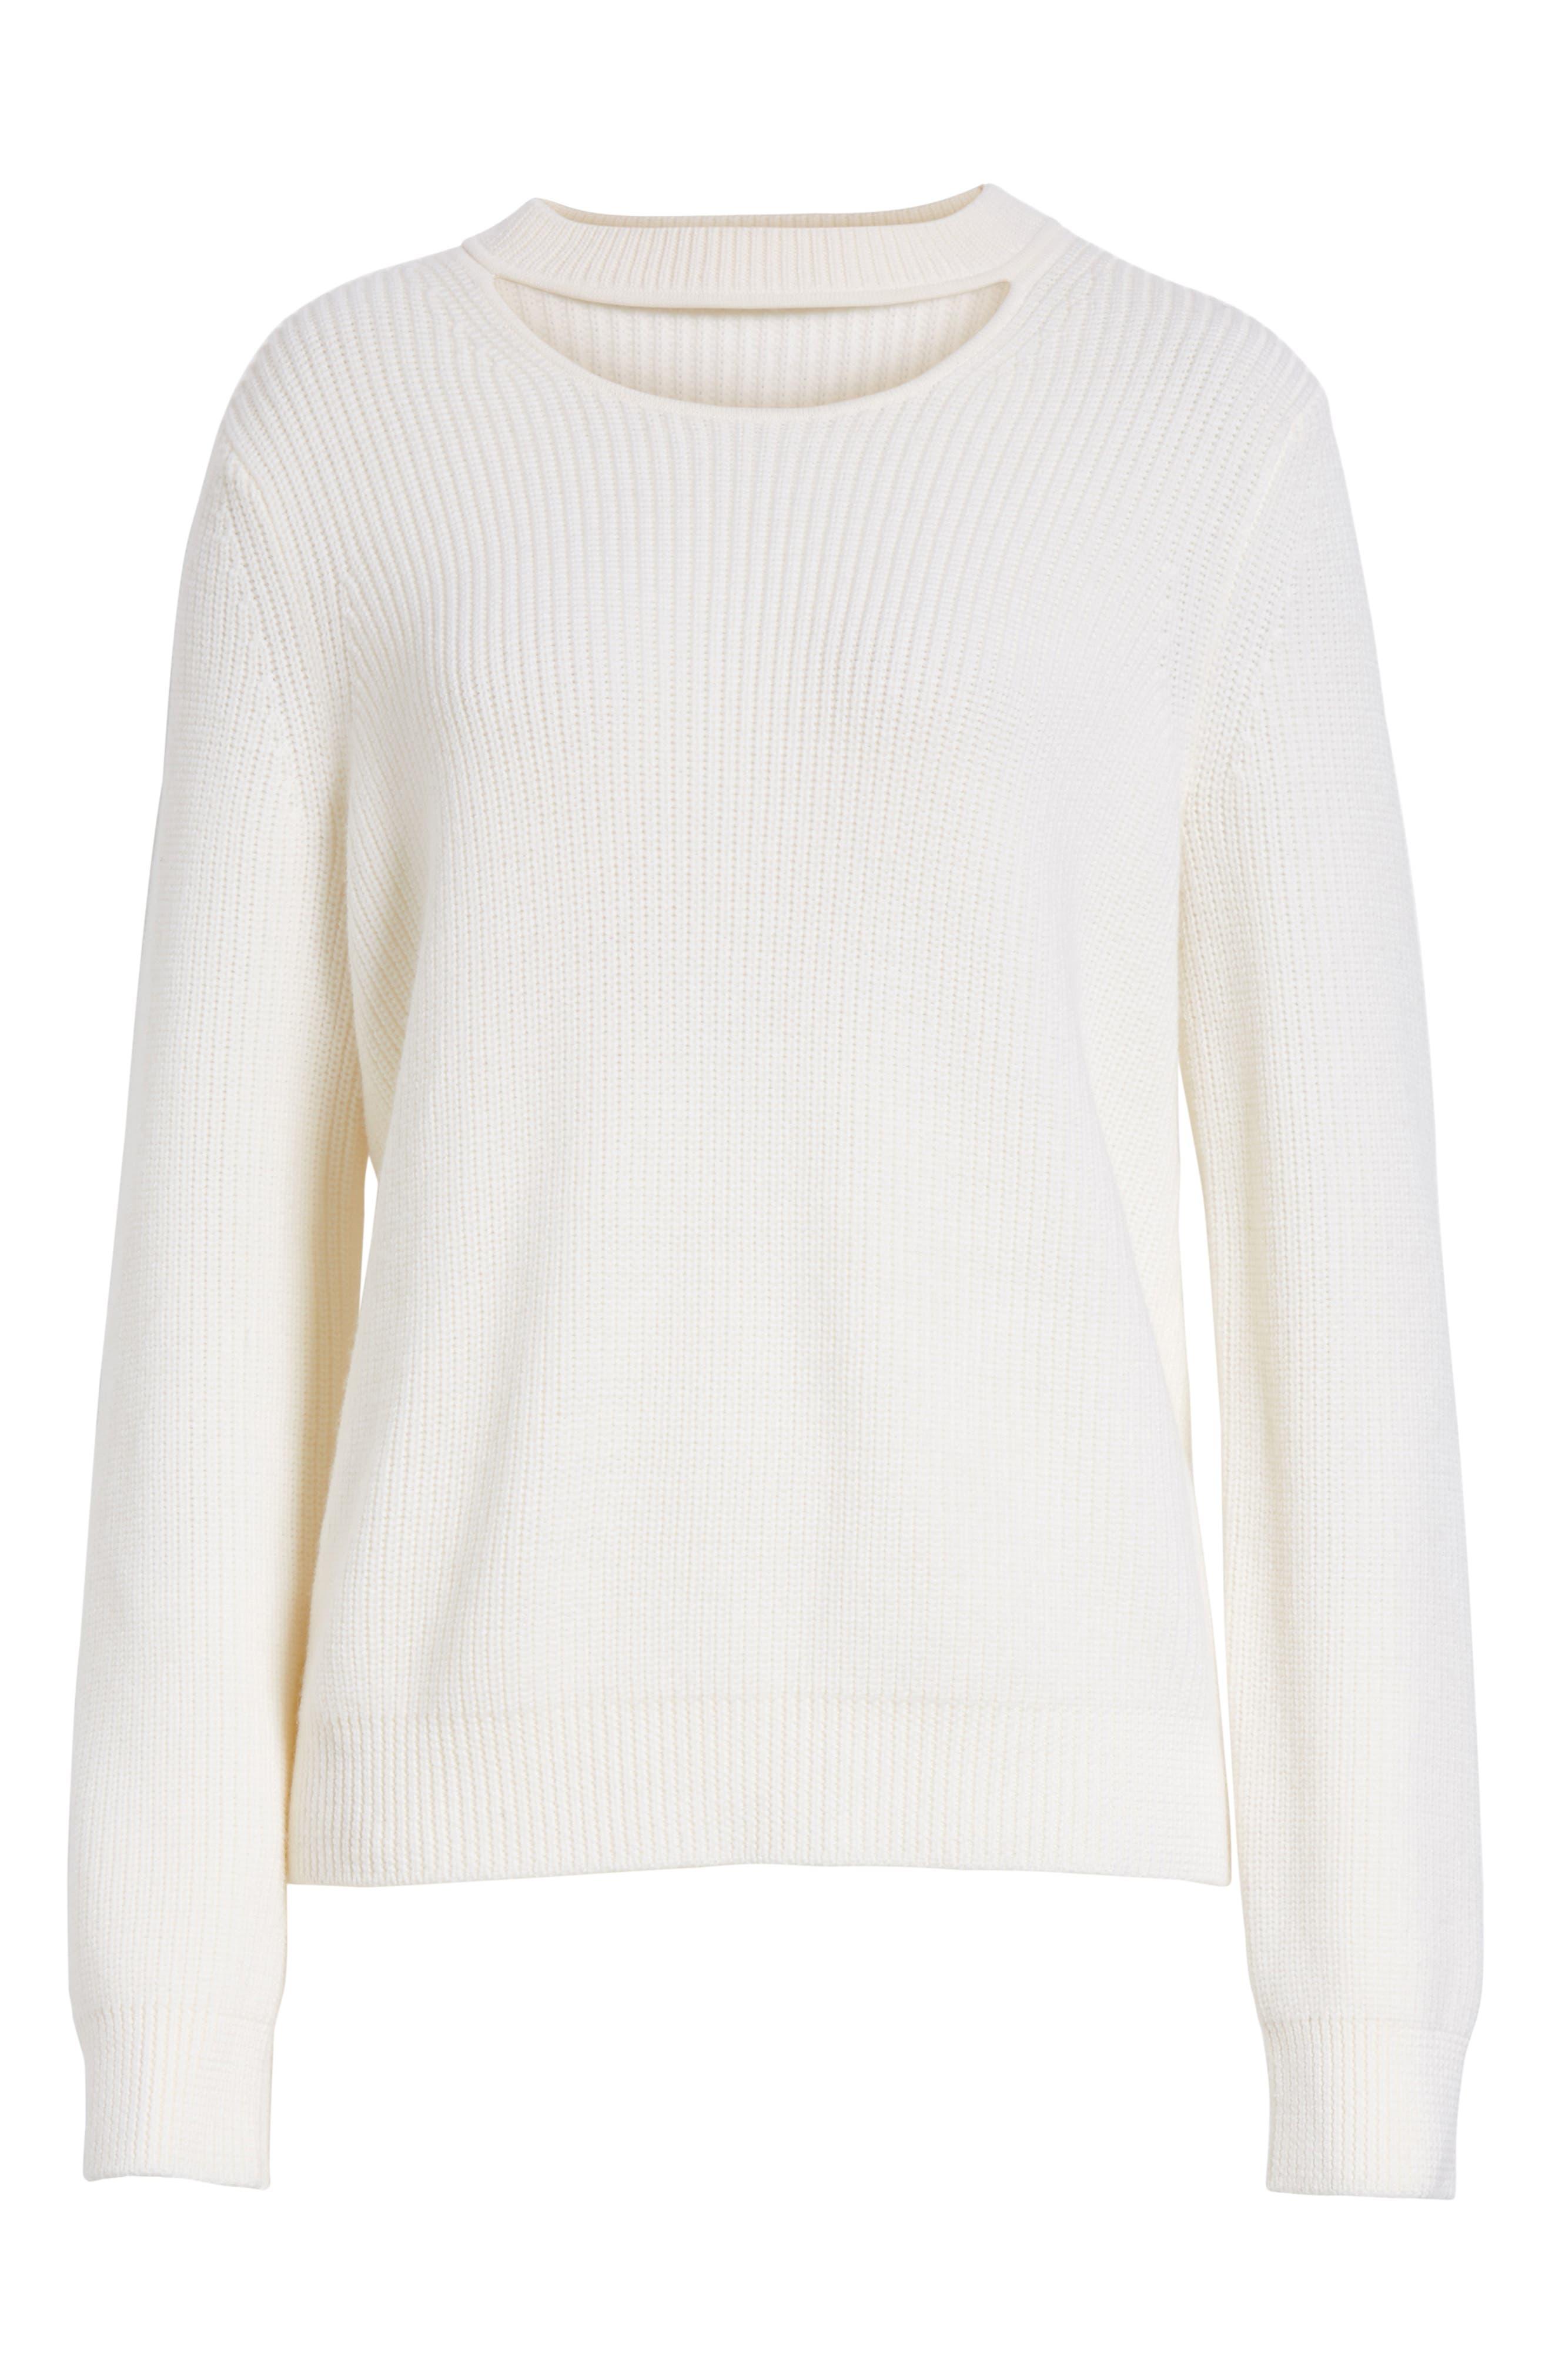 Tori Cutout Sweatshirt,                             Main thumbnail 1, color,                             Ivory